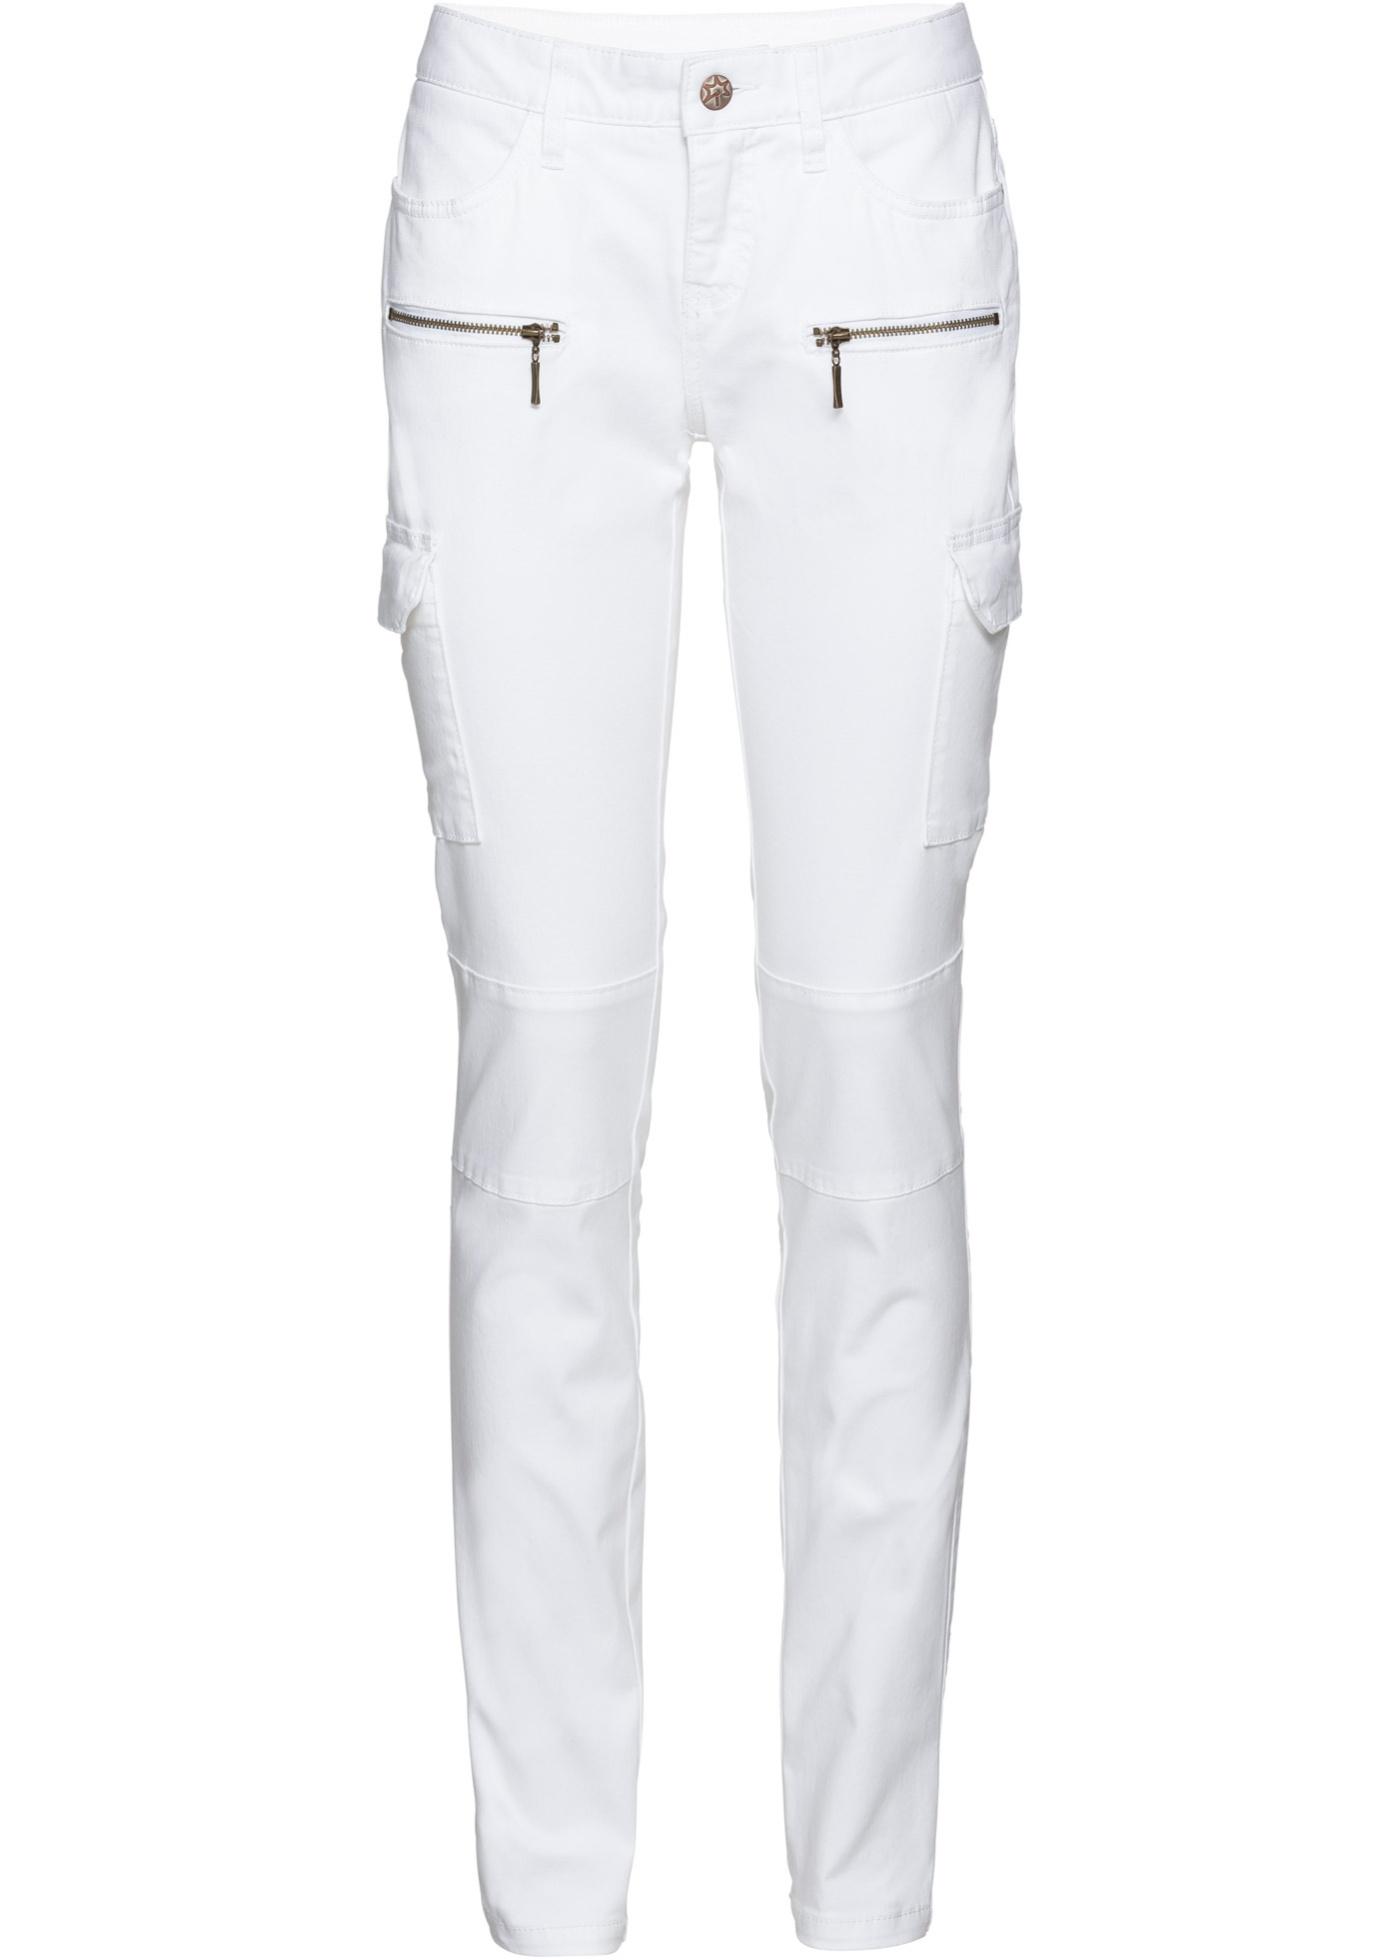 Kargo kalhoty, Skinny - Bílá